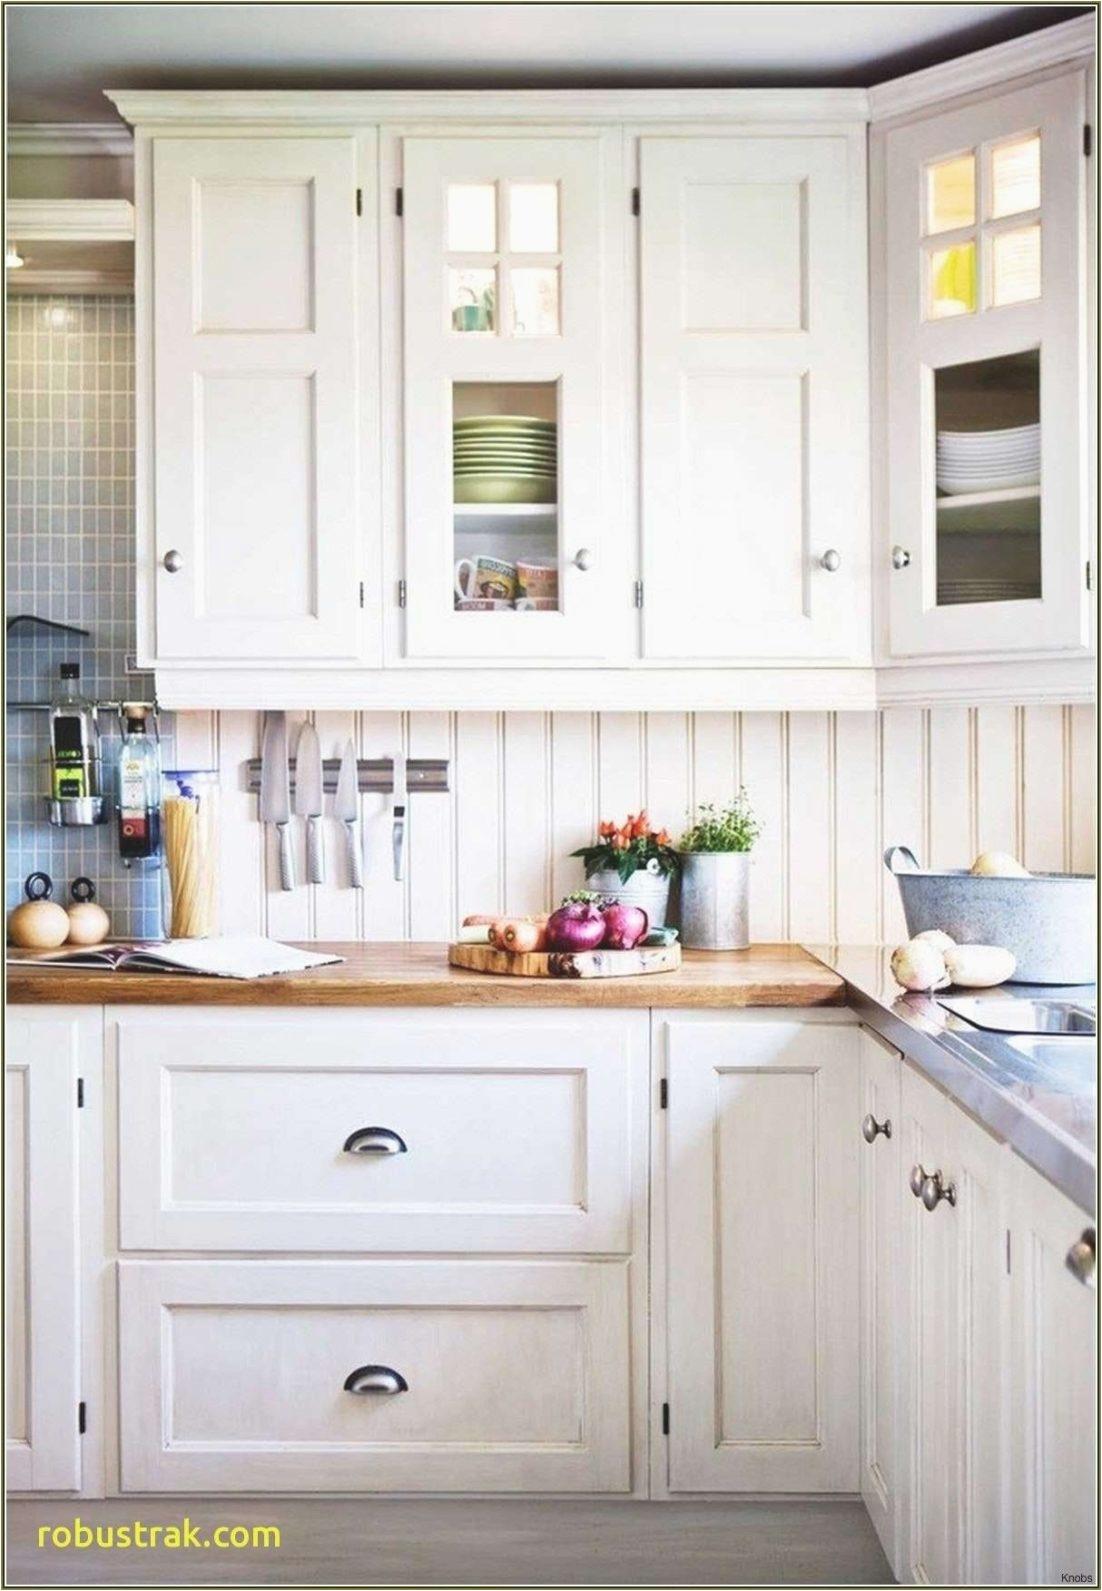 29 Unique Kitchen Cabinets Door Handles Pics Home Ideas Ikea Kitchen Cabinet Door Handles Hardware